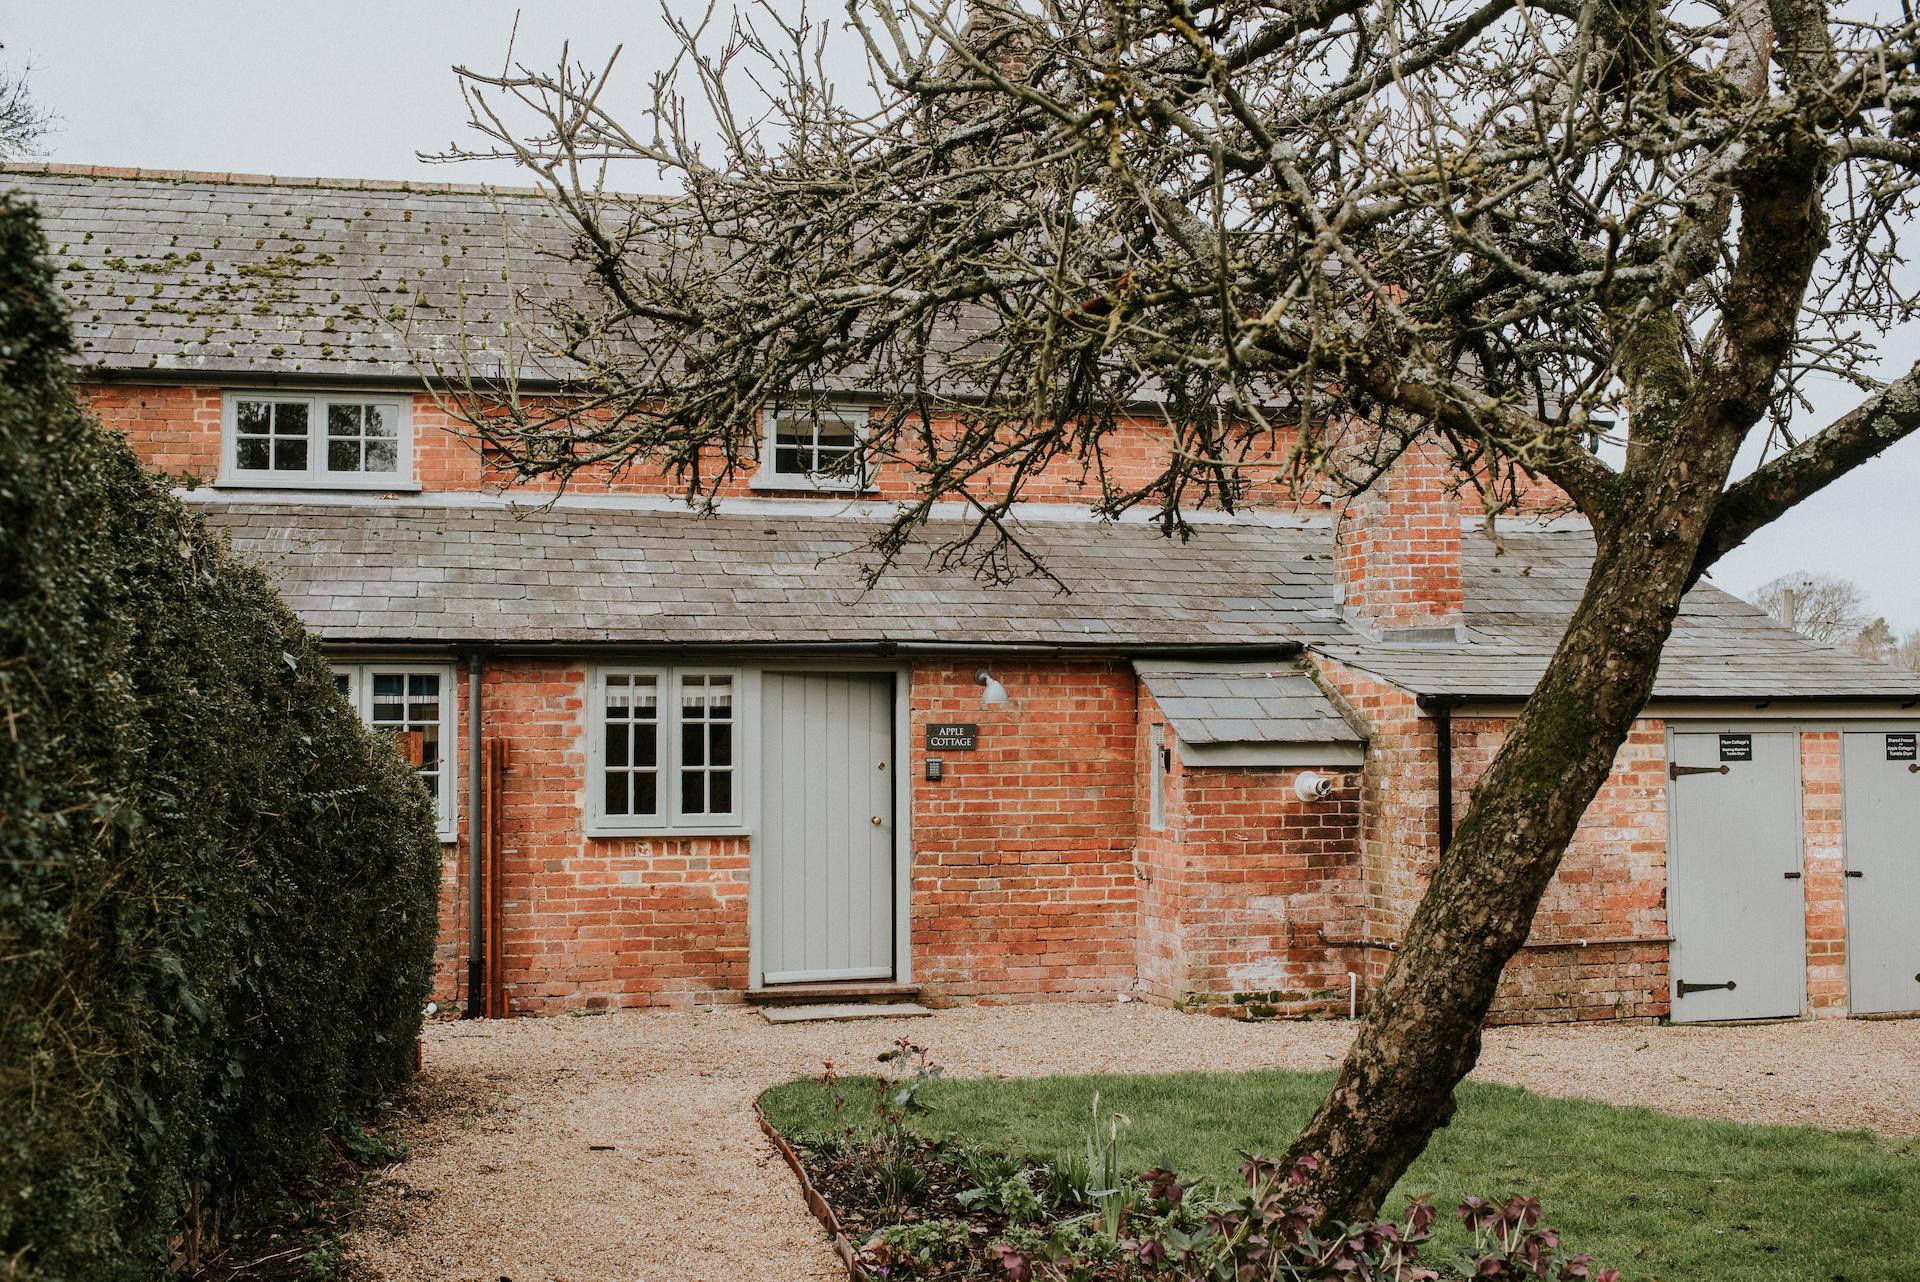 005-deanscourt_cottages(C)EmmaDavenport.jpg